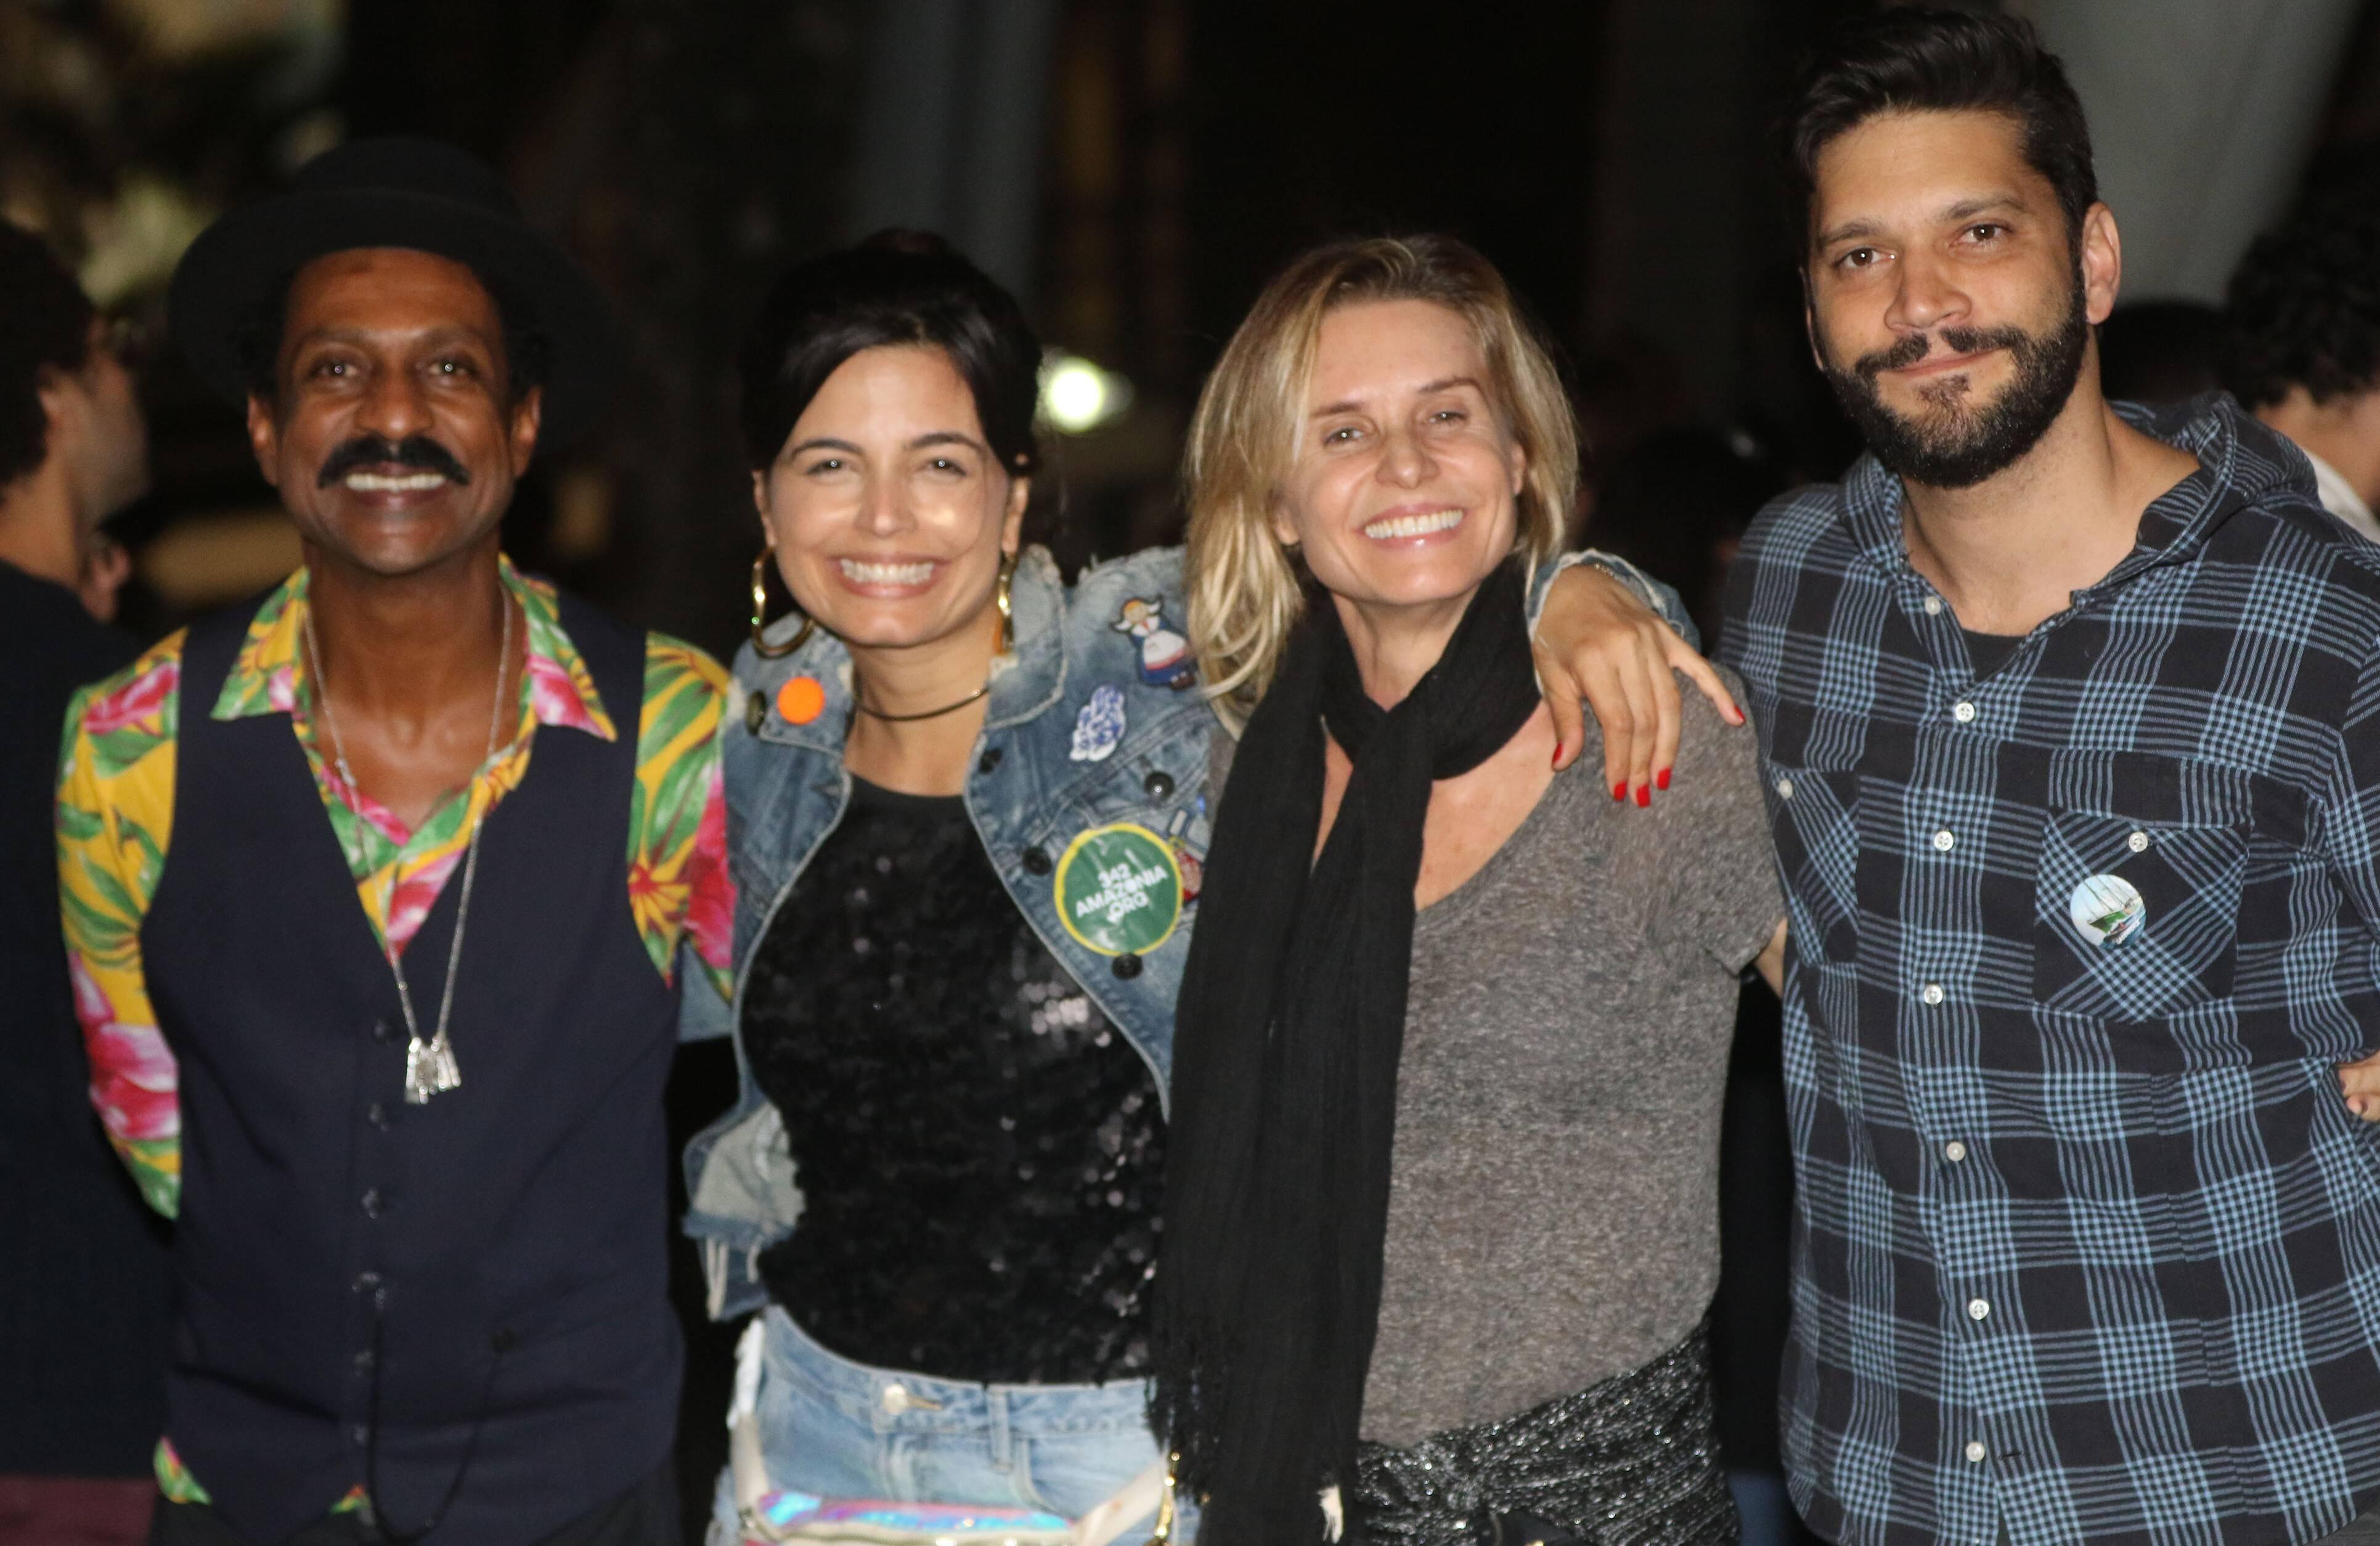 Luis Miranda, Emanuelle Araújo, Paula Burlamaqui e Armando Babaioff /Foto: Eny Miranda